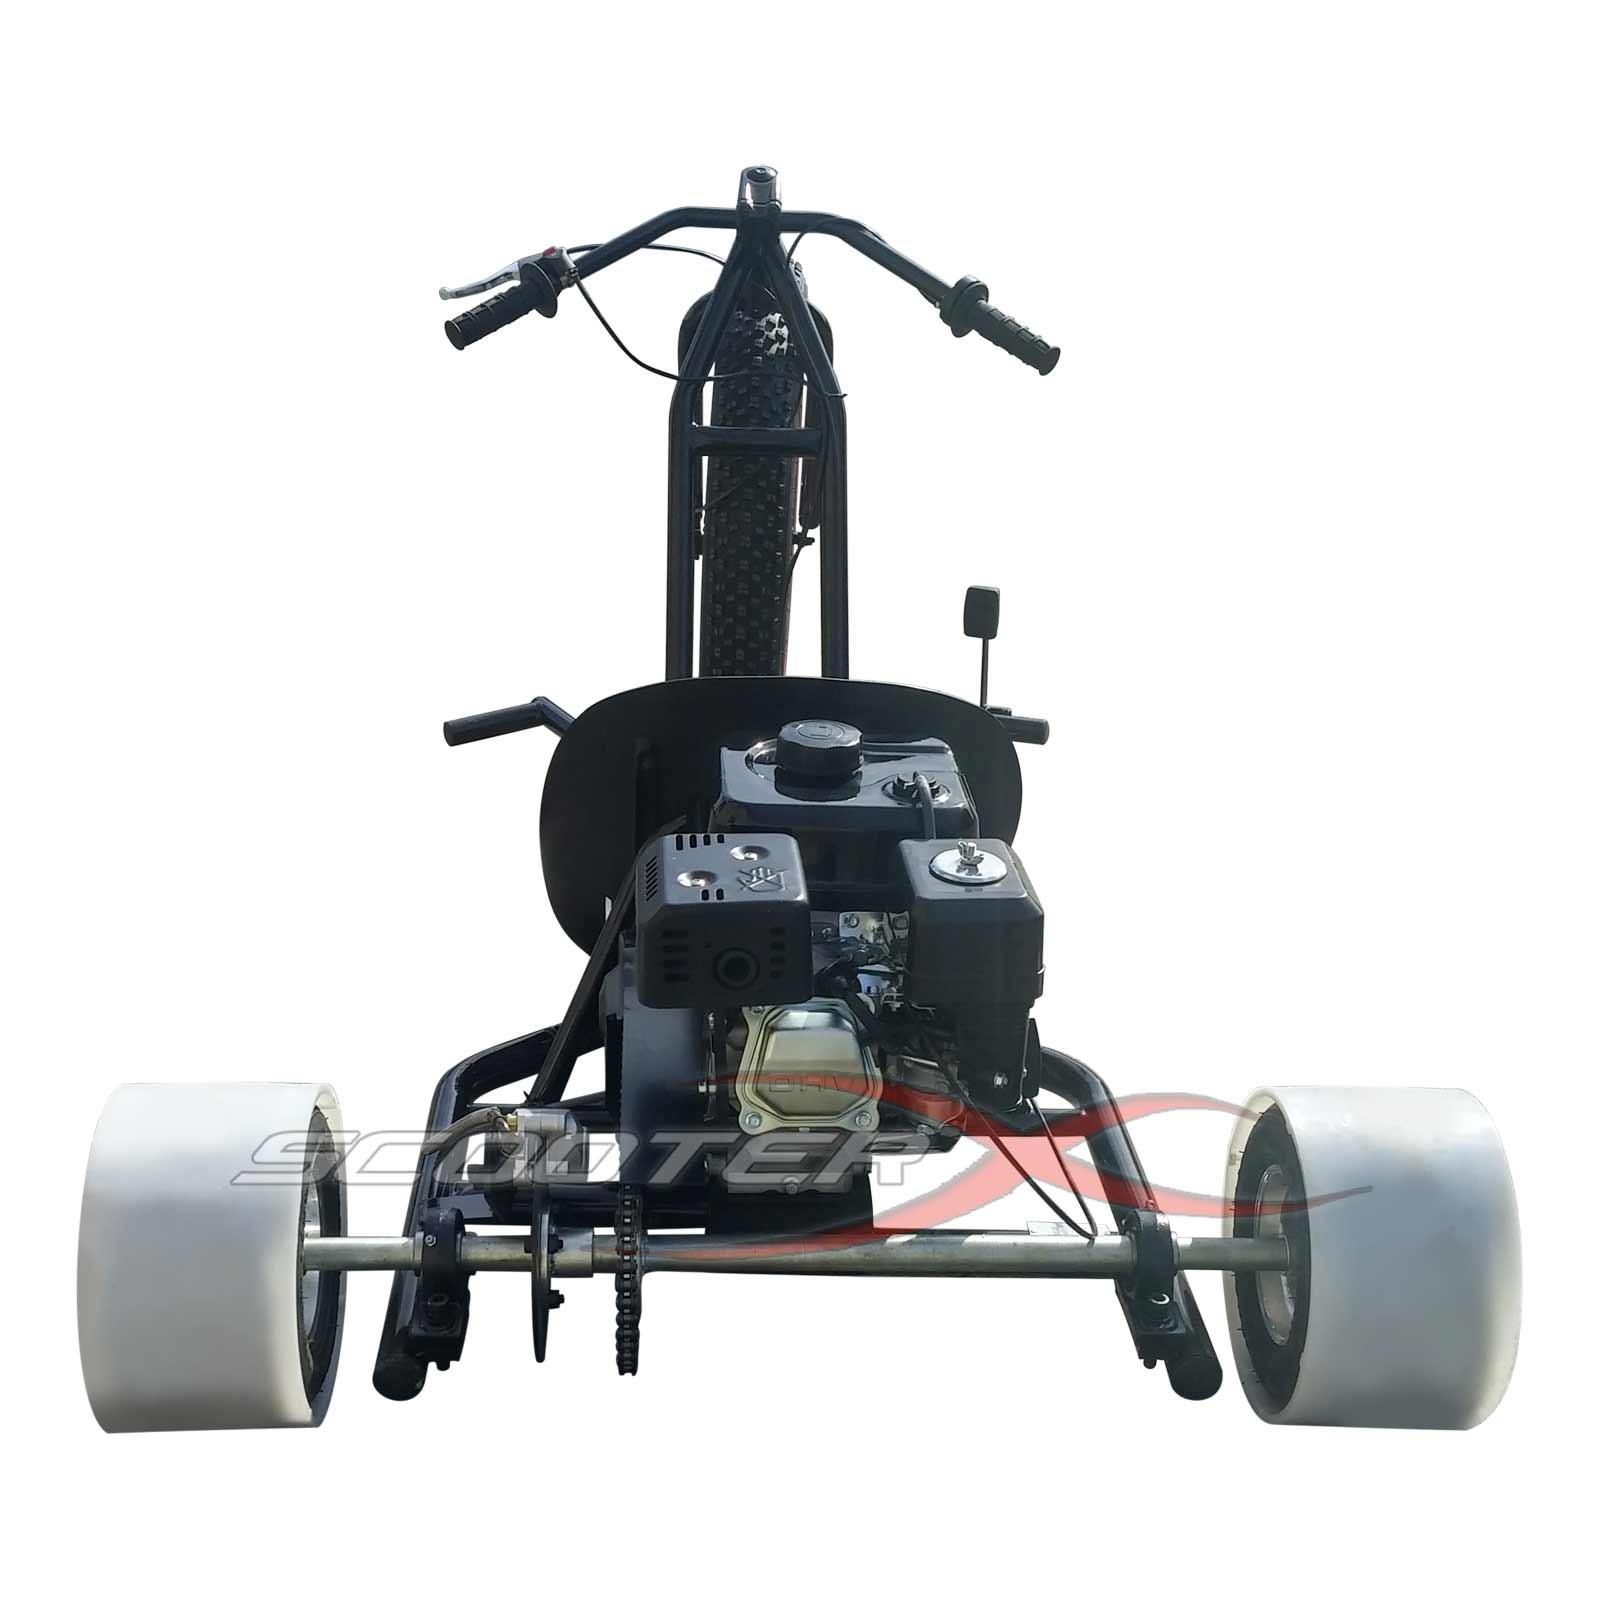 Extreme 6 5 HP Gas Drift Trike 3 Wheel Big Wheel